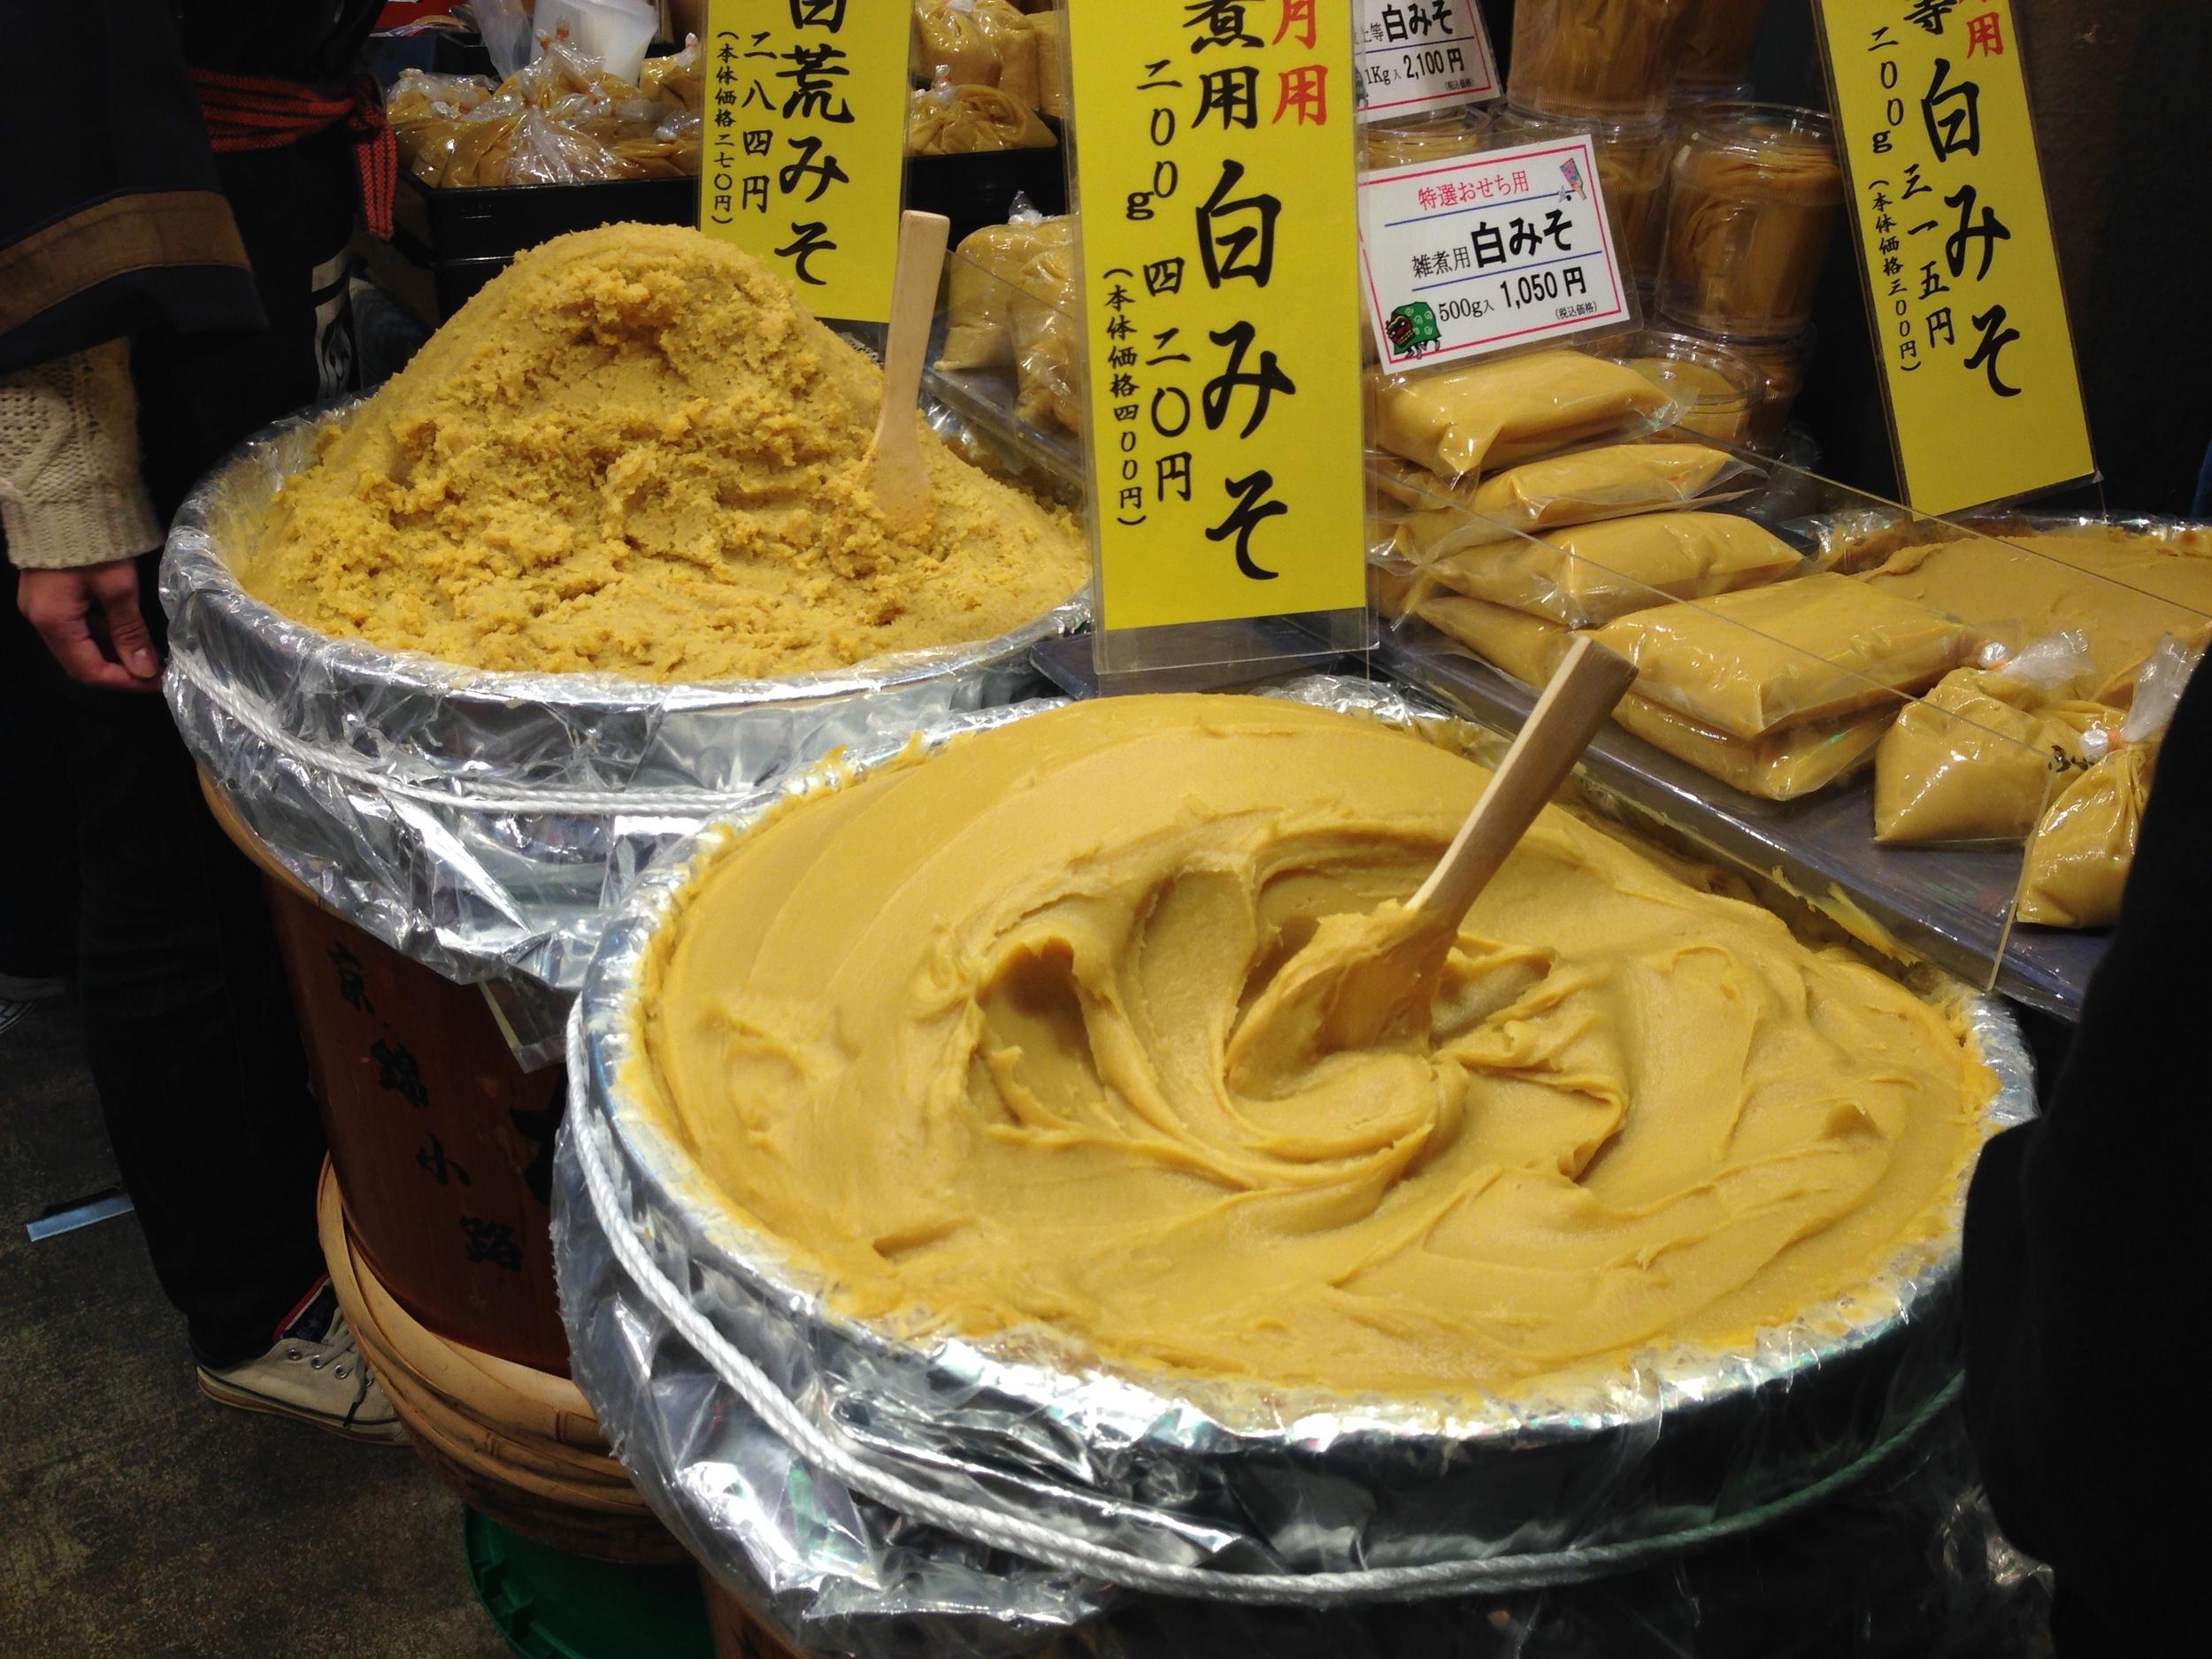 Barrels of miso paste at the Nishiki Food Market